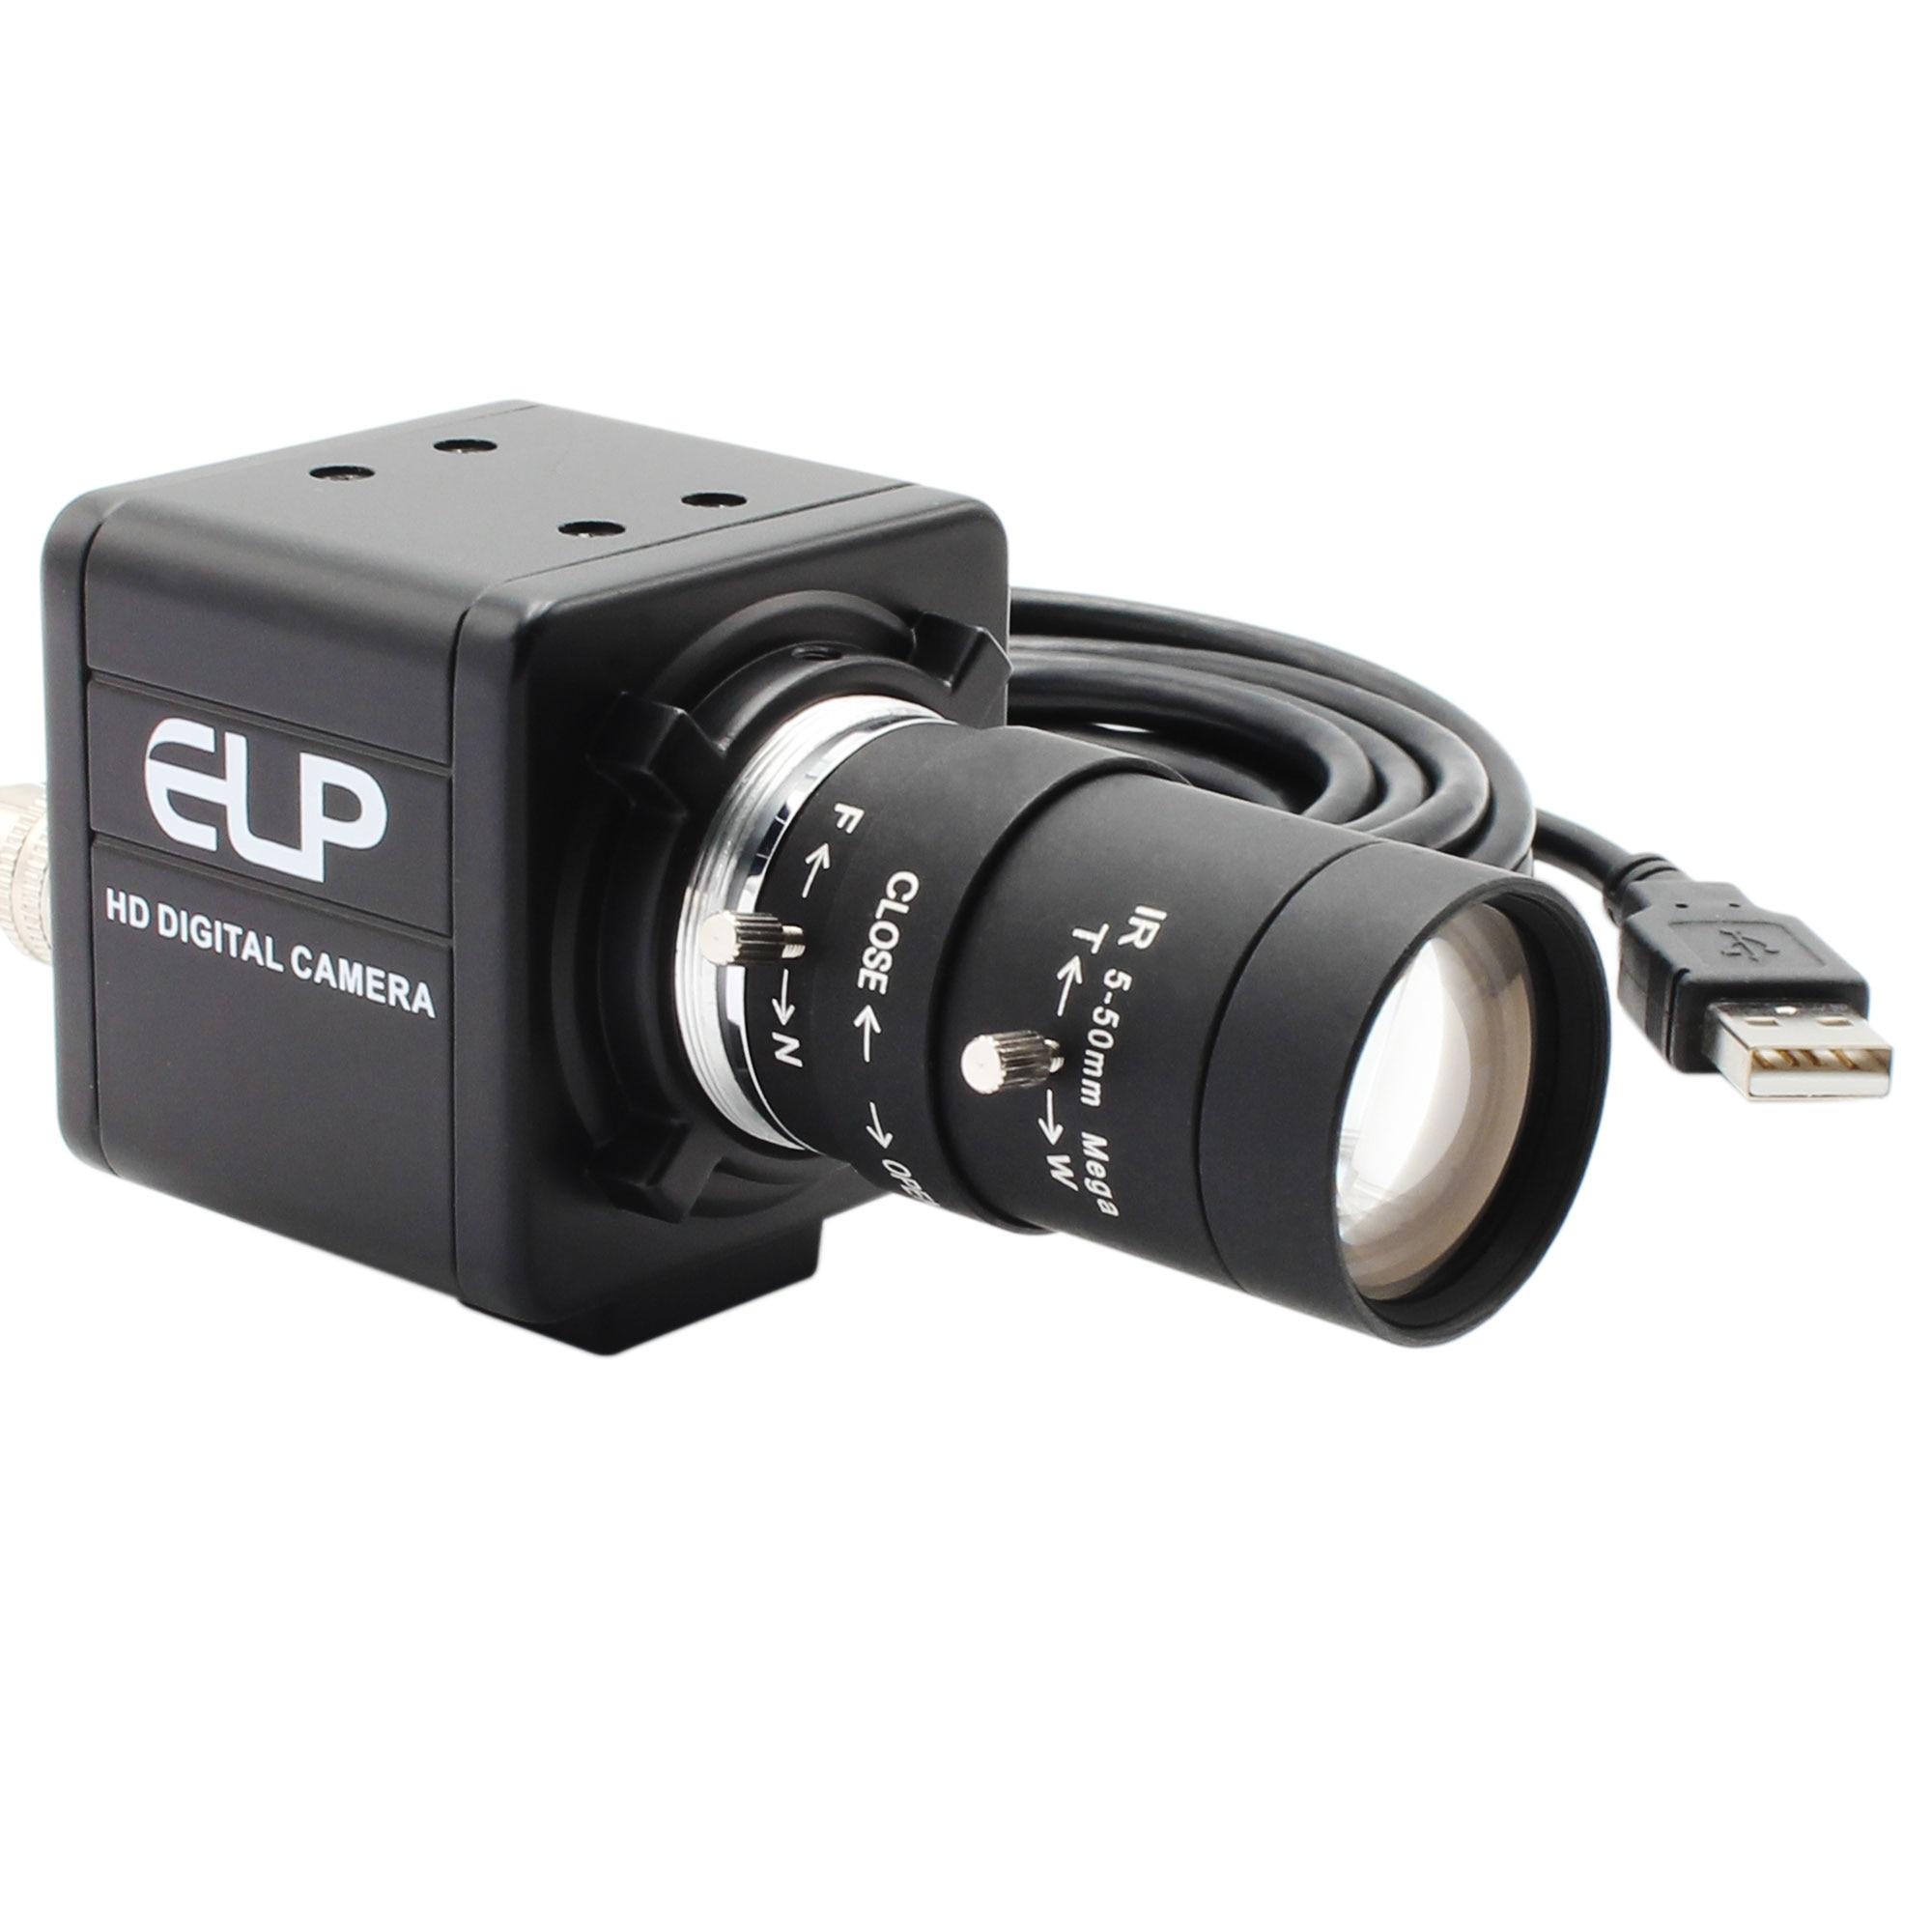 1080п ЦМОС ОВ2710 високи оквир МЈПЕГ 120фпс @ 480П 2.8-12мм варифокални приручник Ирис Варифоцал Објектив ЦЦТВ Сецурити Мини усб камера 2МП